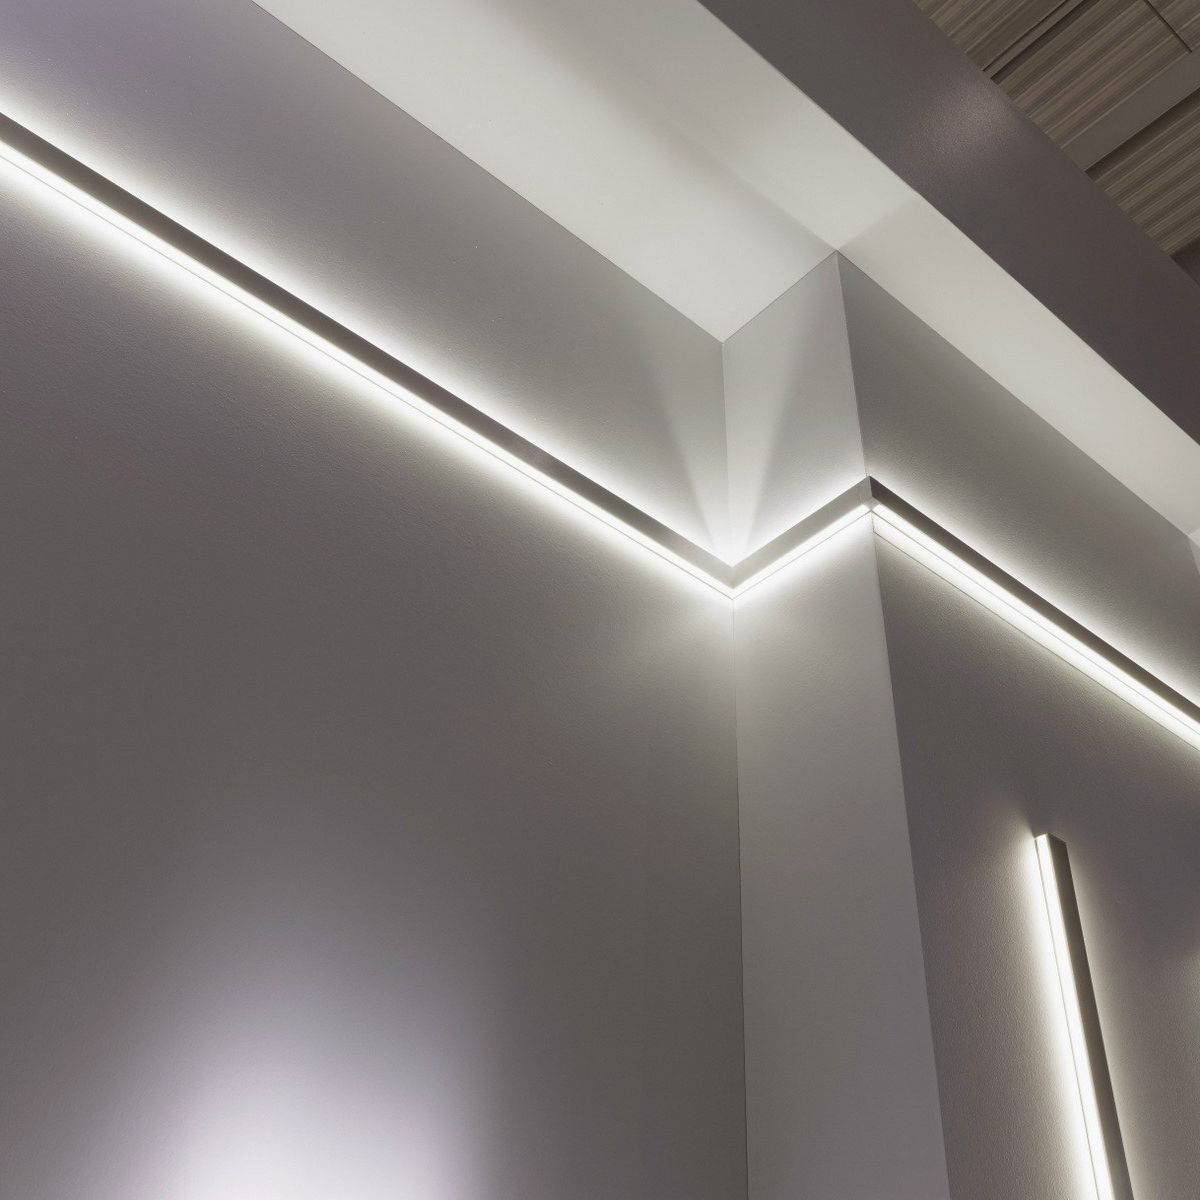 Wall-mounted lighting profile / LED / modular lighting system ...